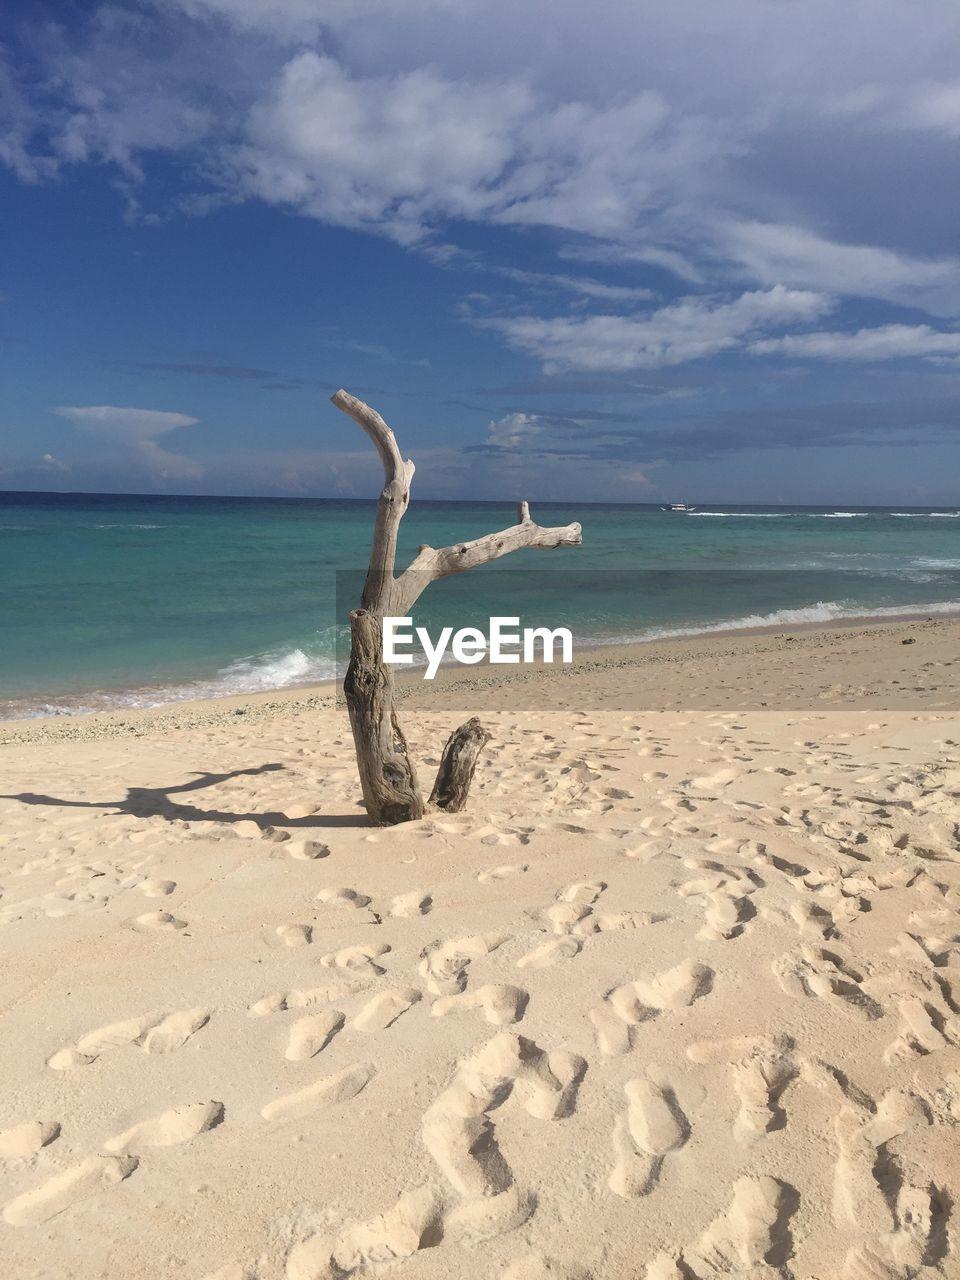 land, water, beach, sea, sky, cloud - sky, sand, horizon over water, horizon, beauty in nature, nature, scenics - nature, tranquility, tranquil scene, day, non-urban scene, idyllic, no people, sunlight, driftwood